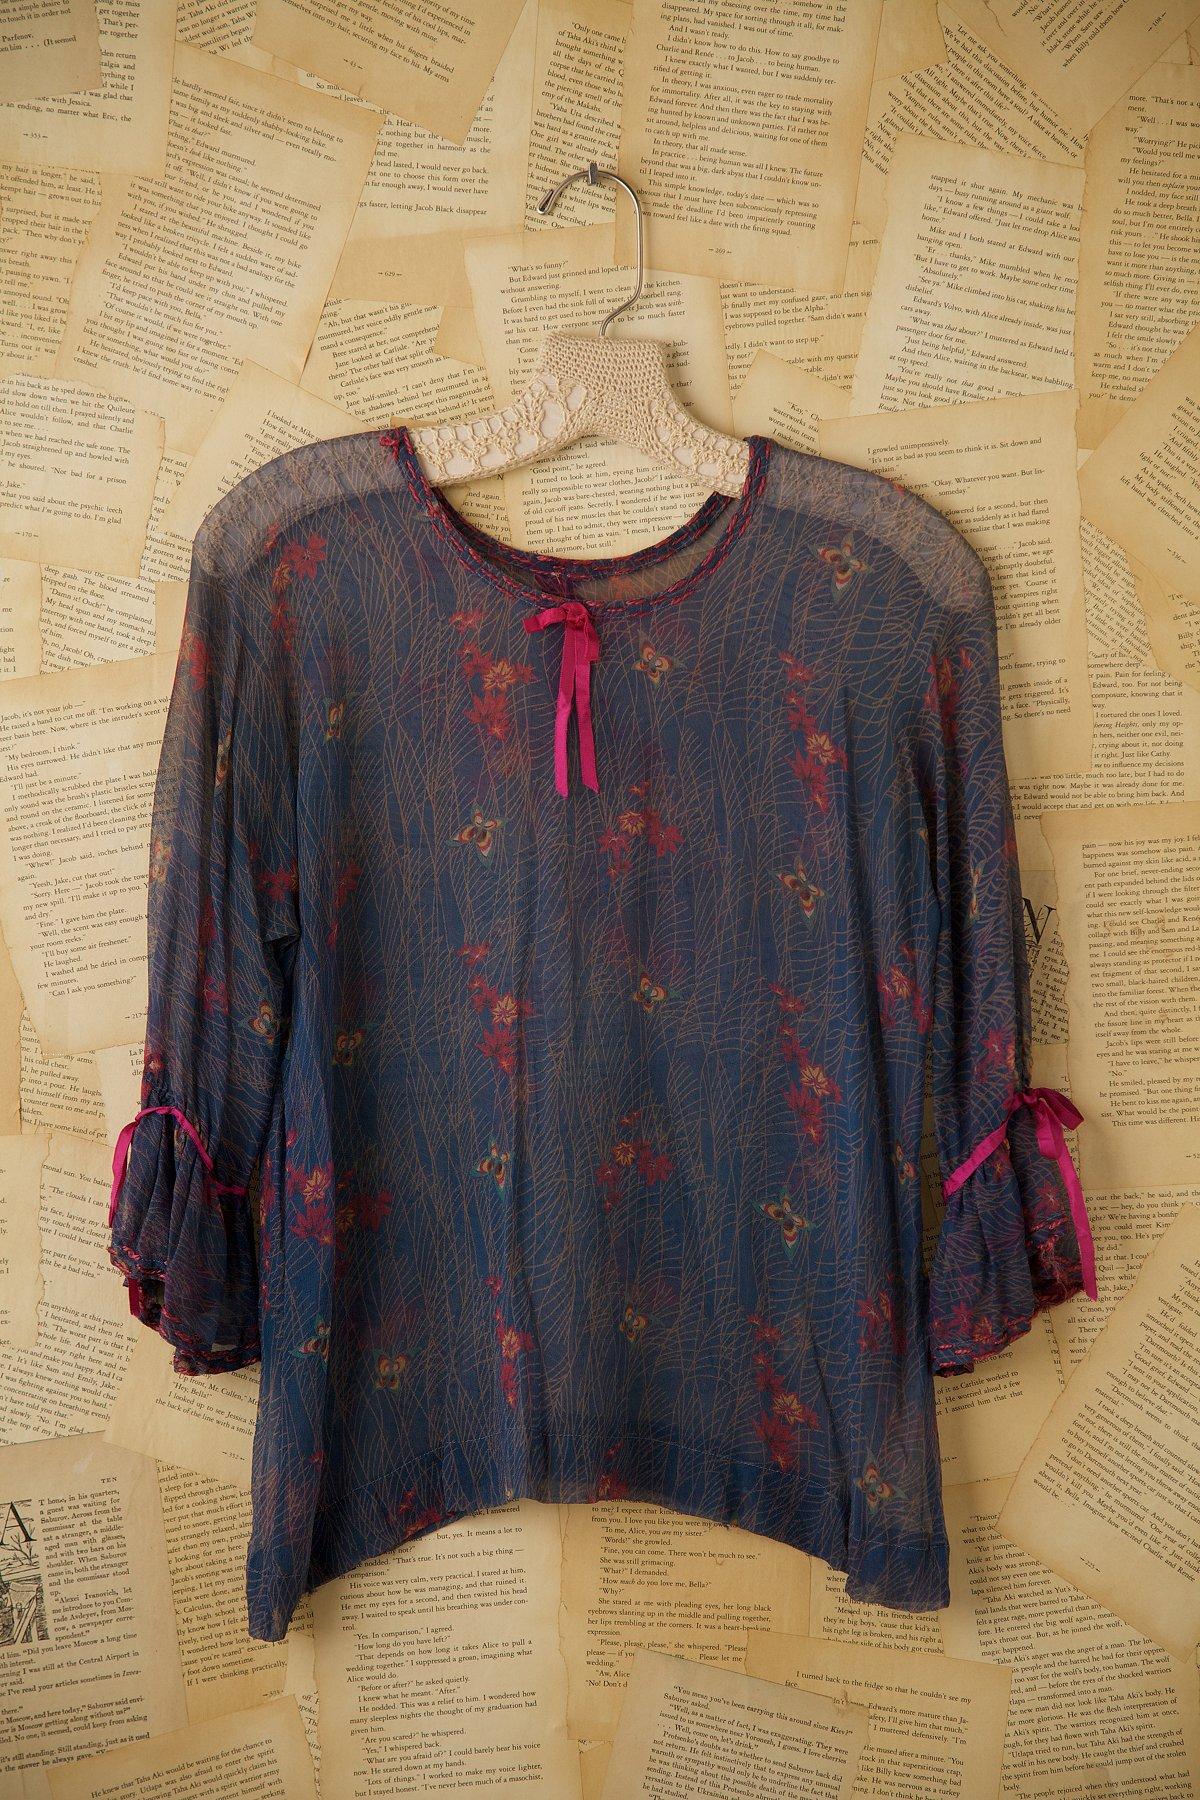 Vintage 1920s Silk Chiffon Floral Printed Blouse